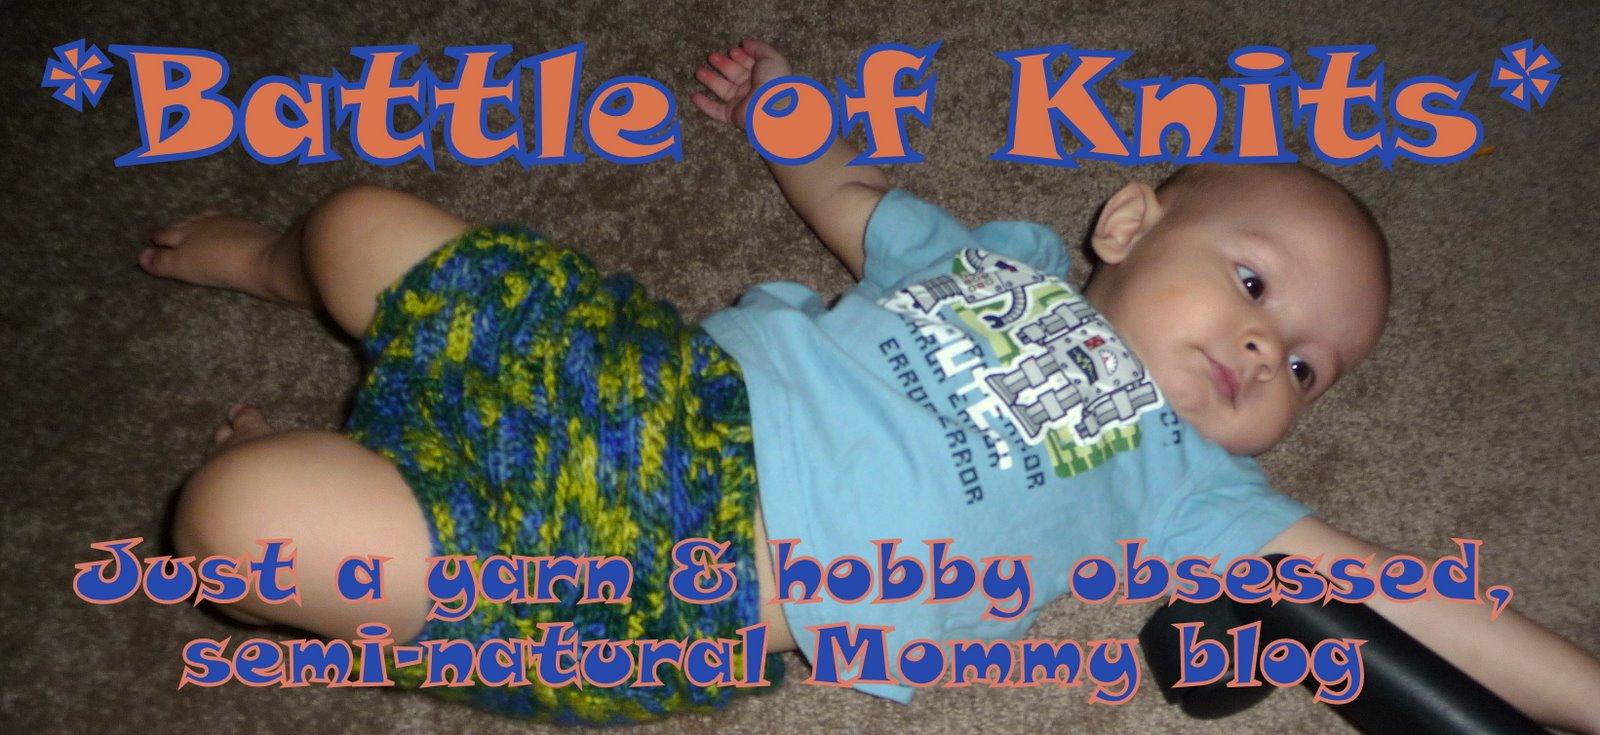 * Battle of Knits *